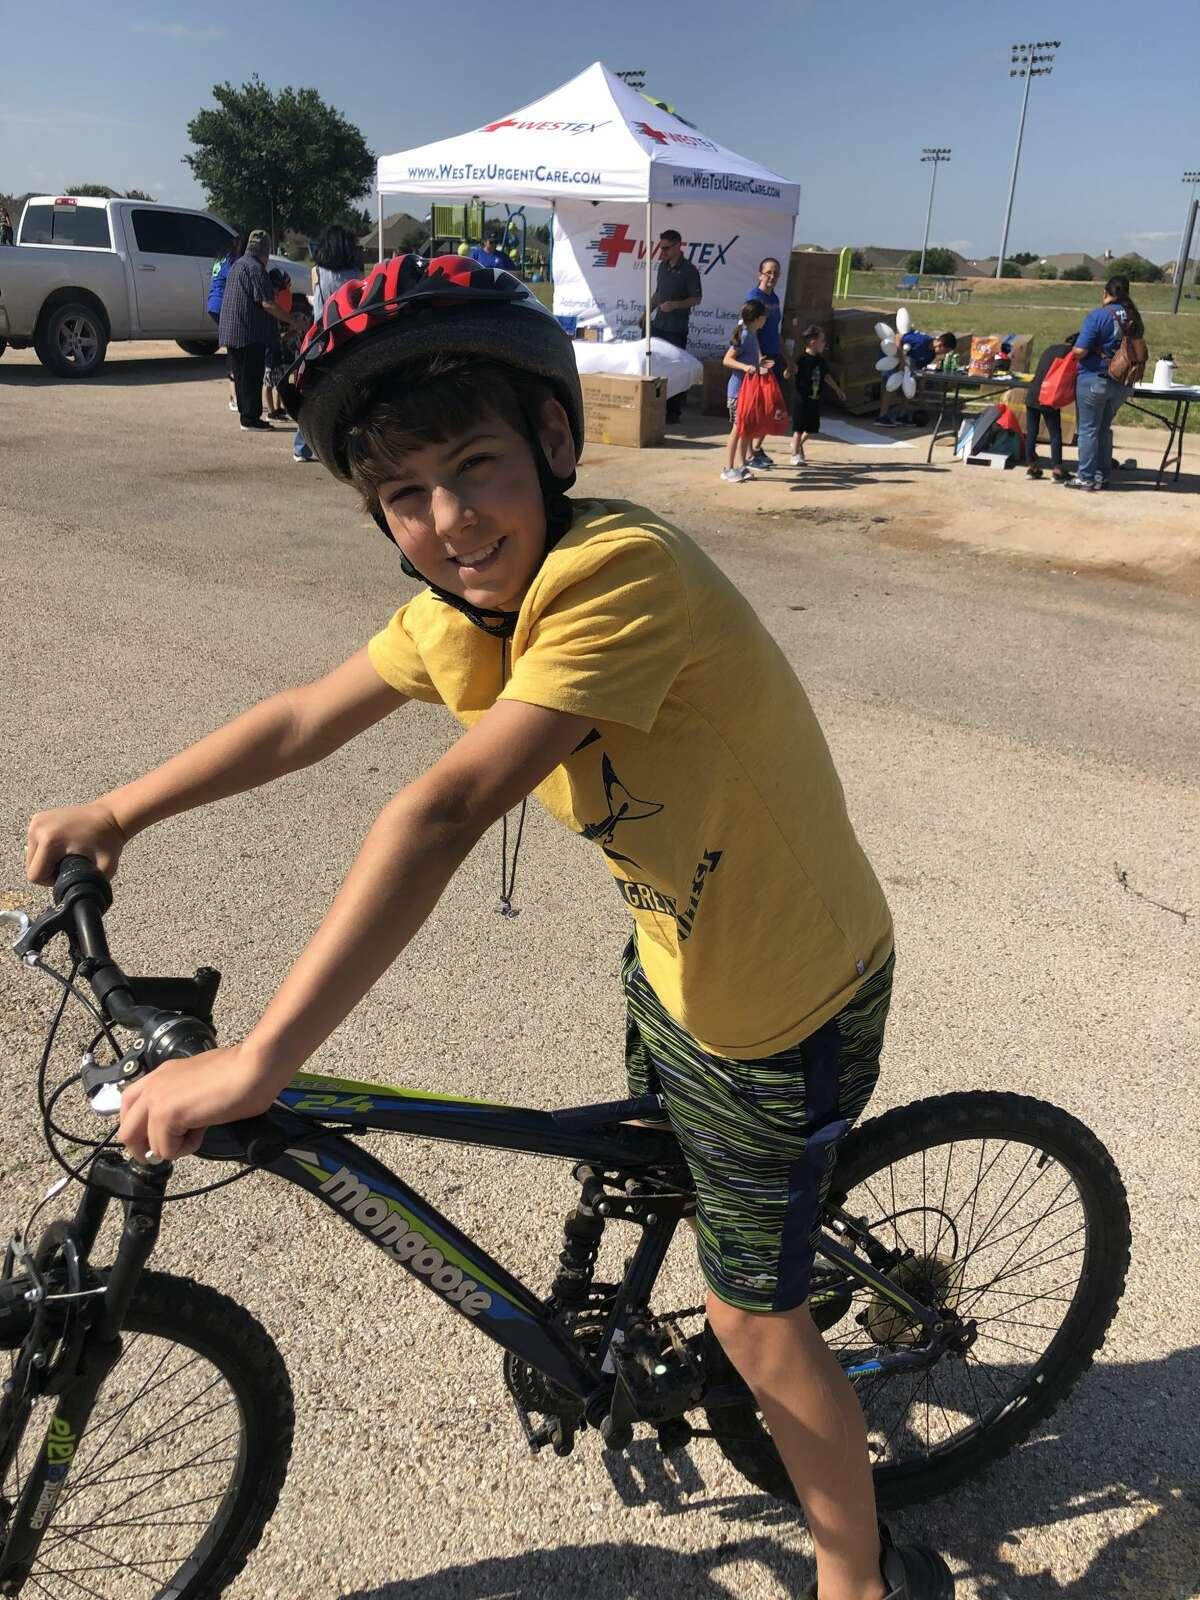 Safety event: Tristan Beck